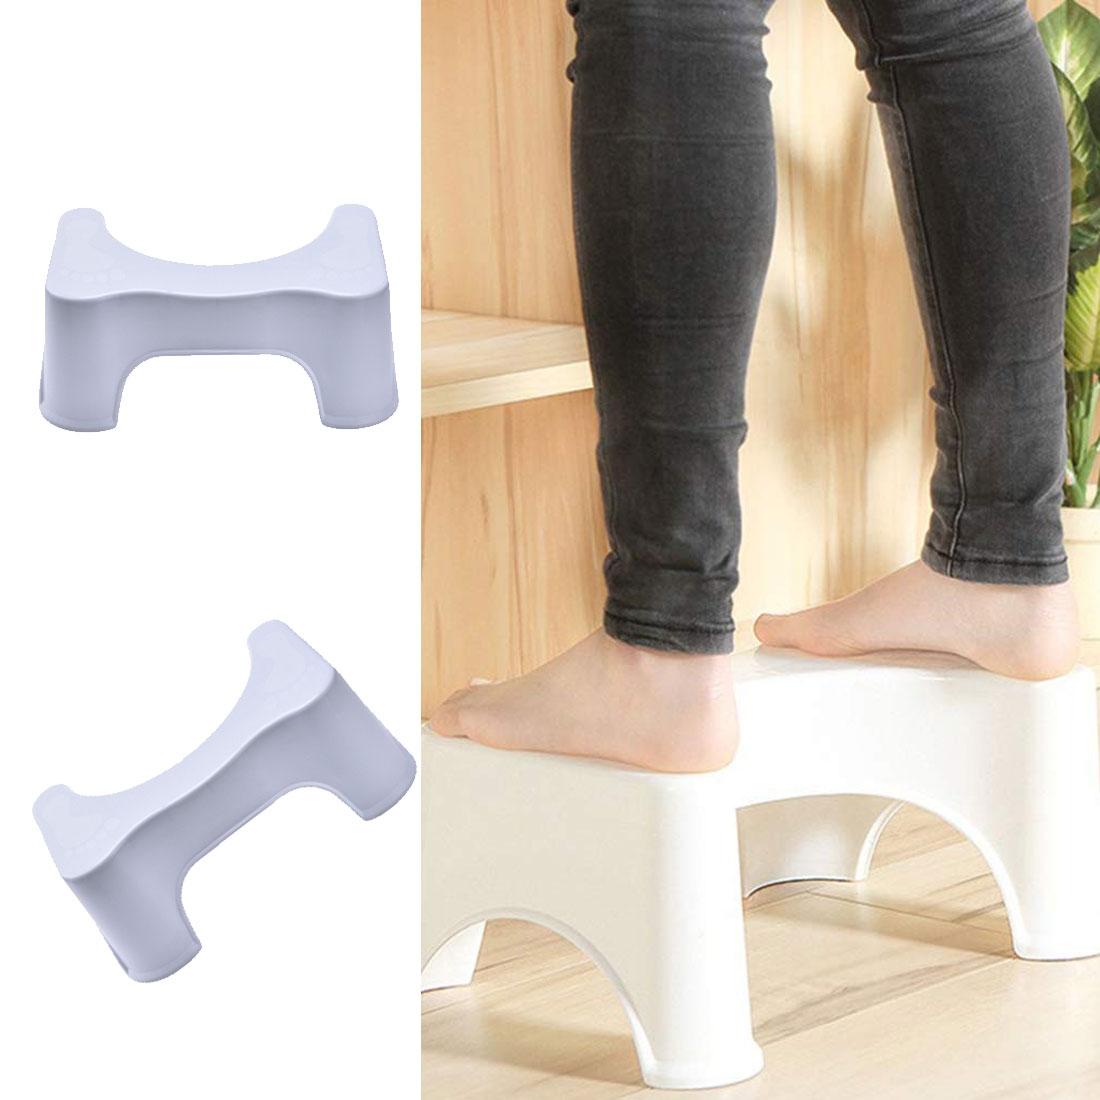 Bathroom Set U-Shaped Toilet Stool Bathroom Non-Slip Stool Helper Assistant Foot Seat Squatting Children Pregnant Footstool